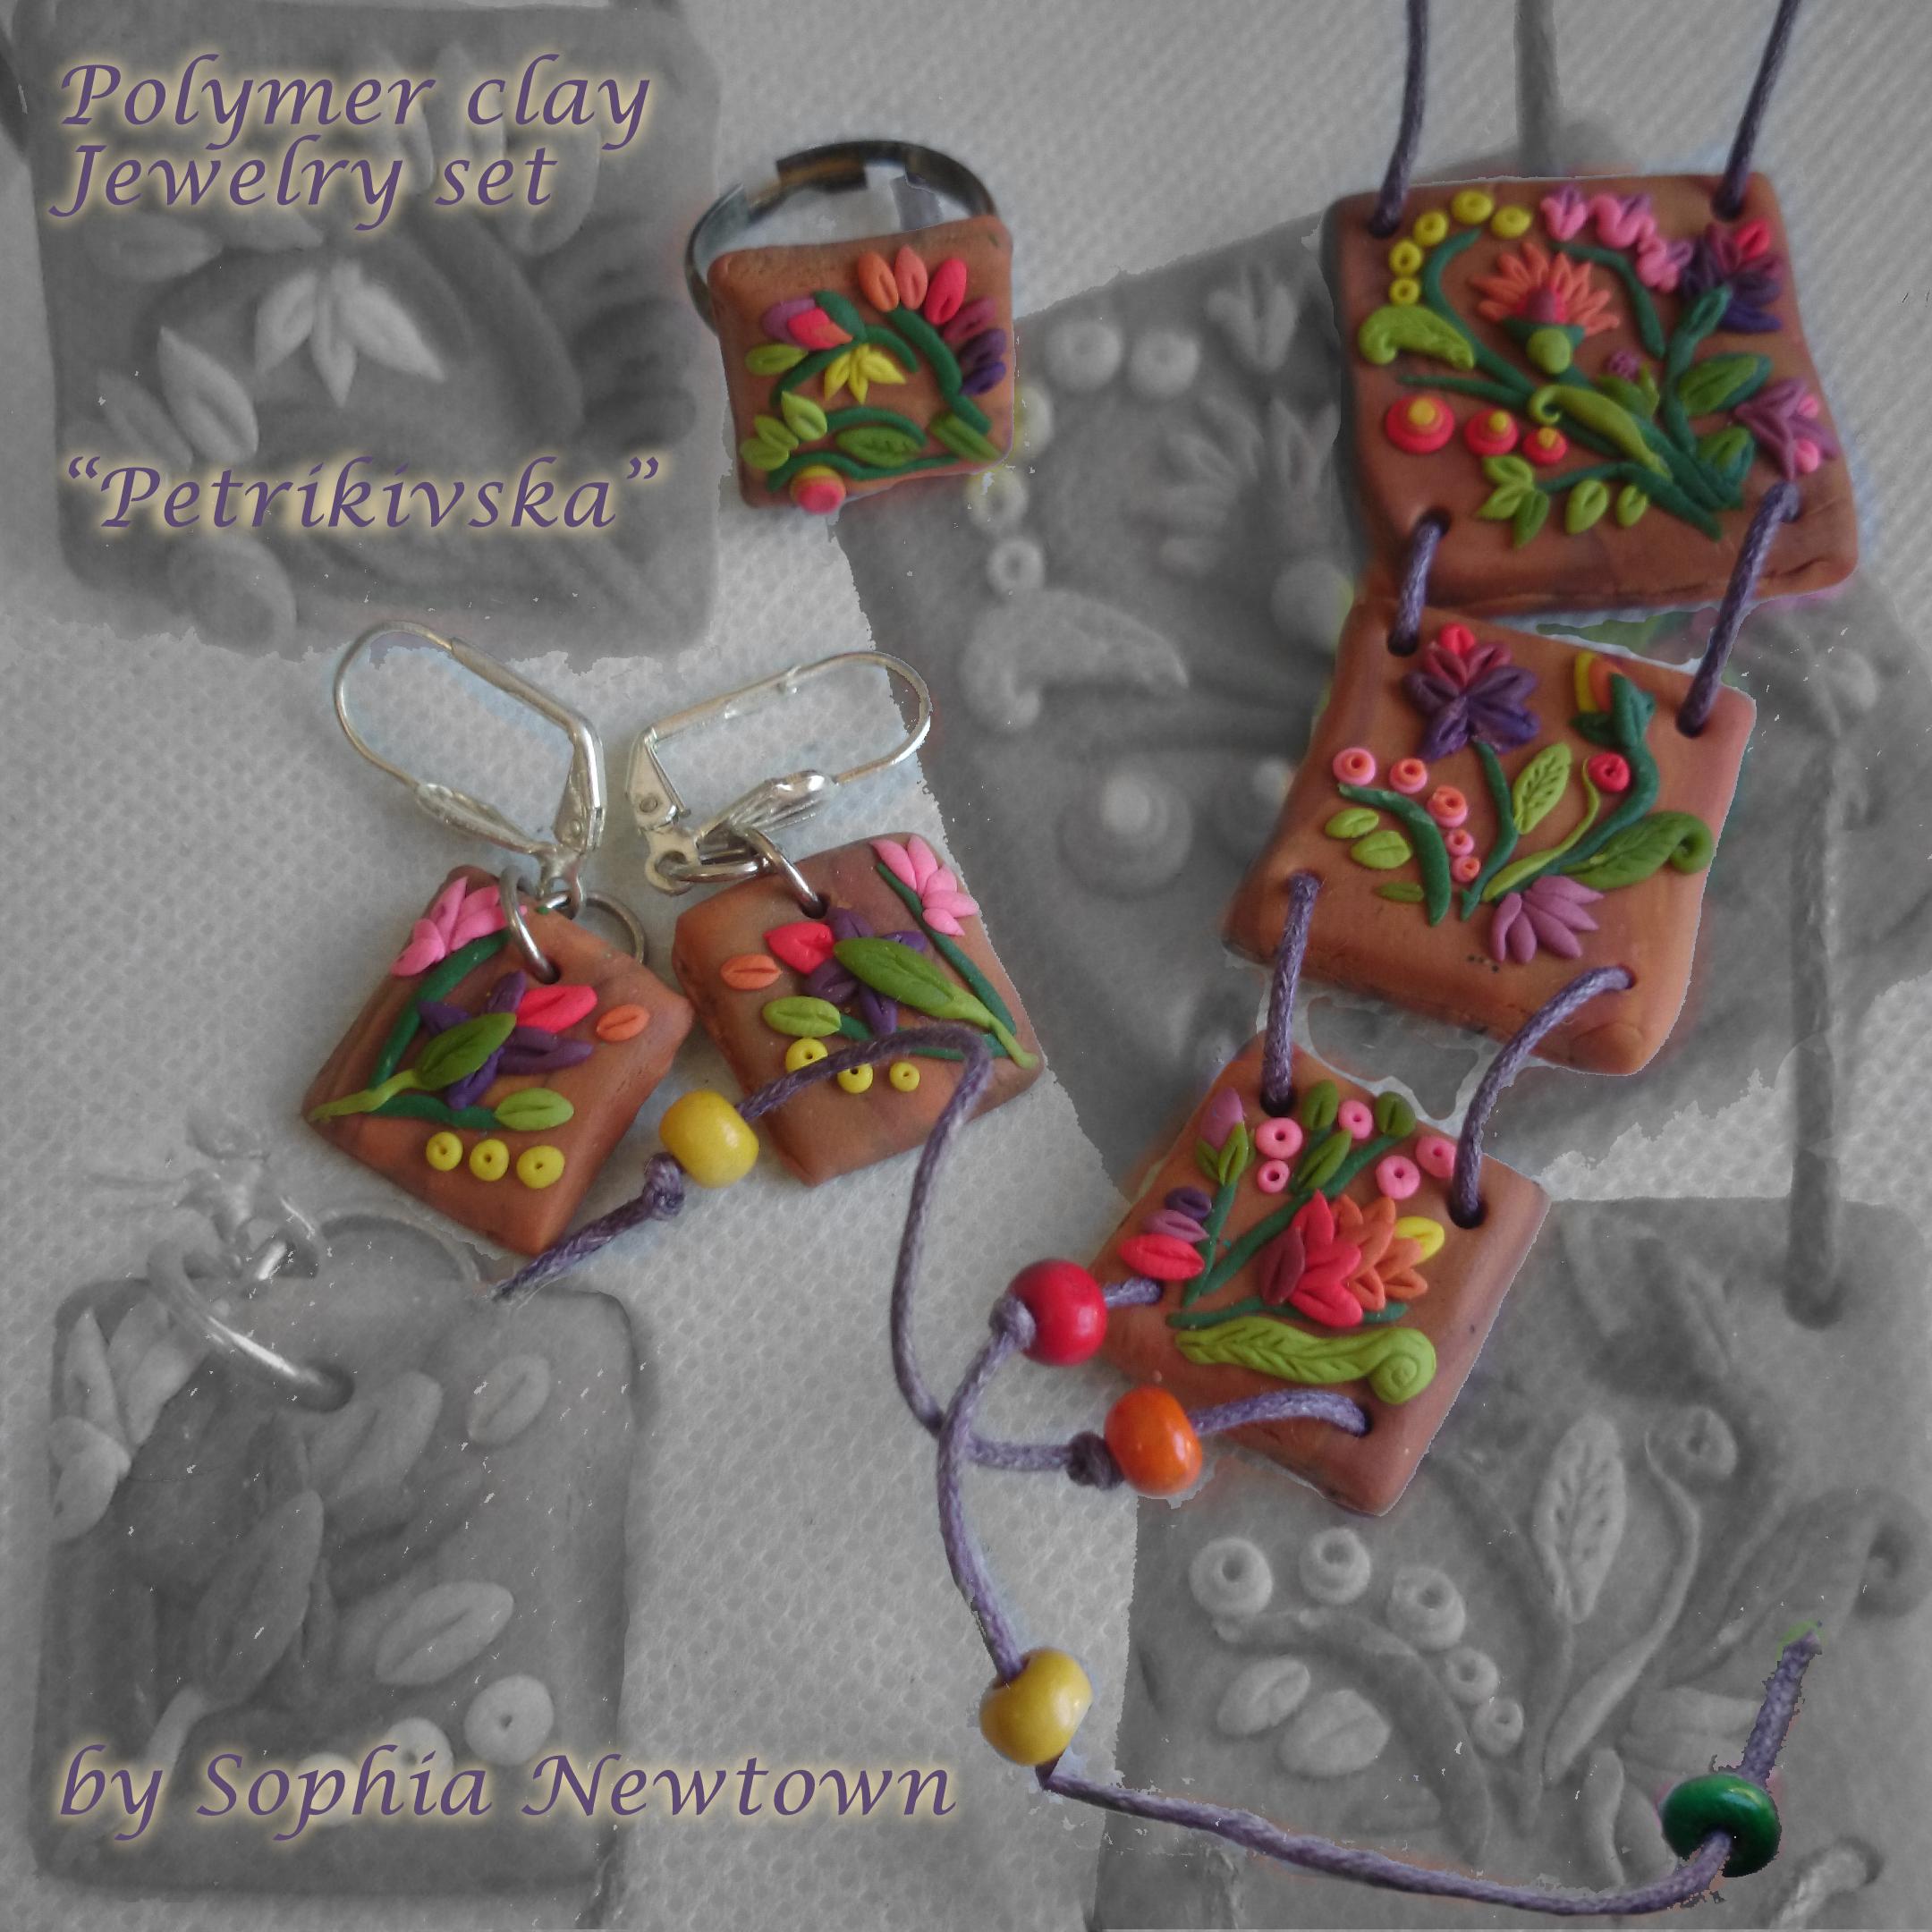 Petrikivska inspired jewelry set